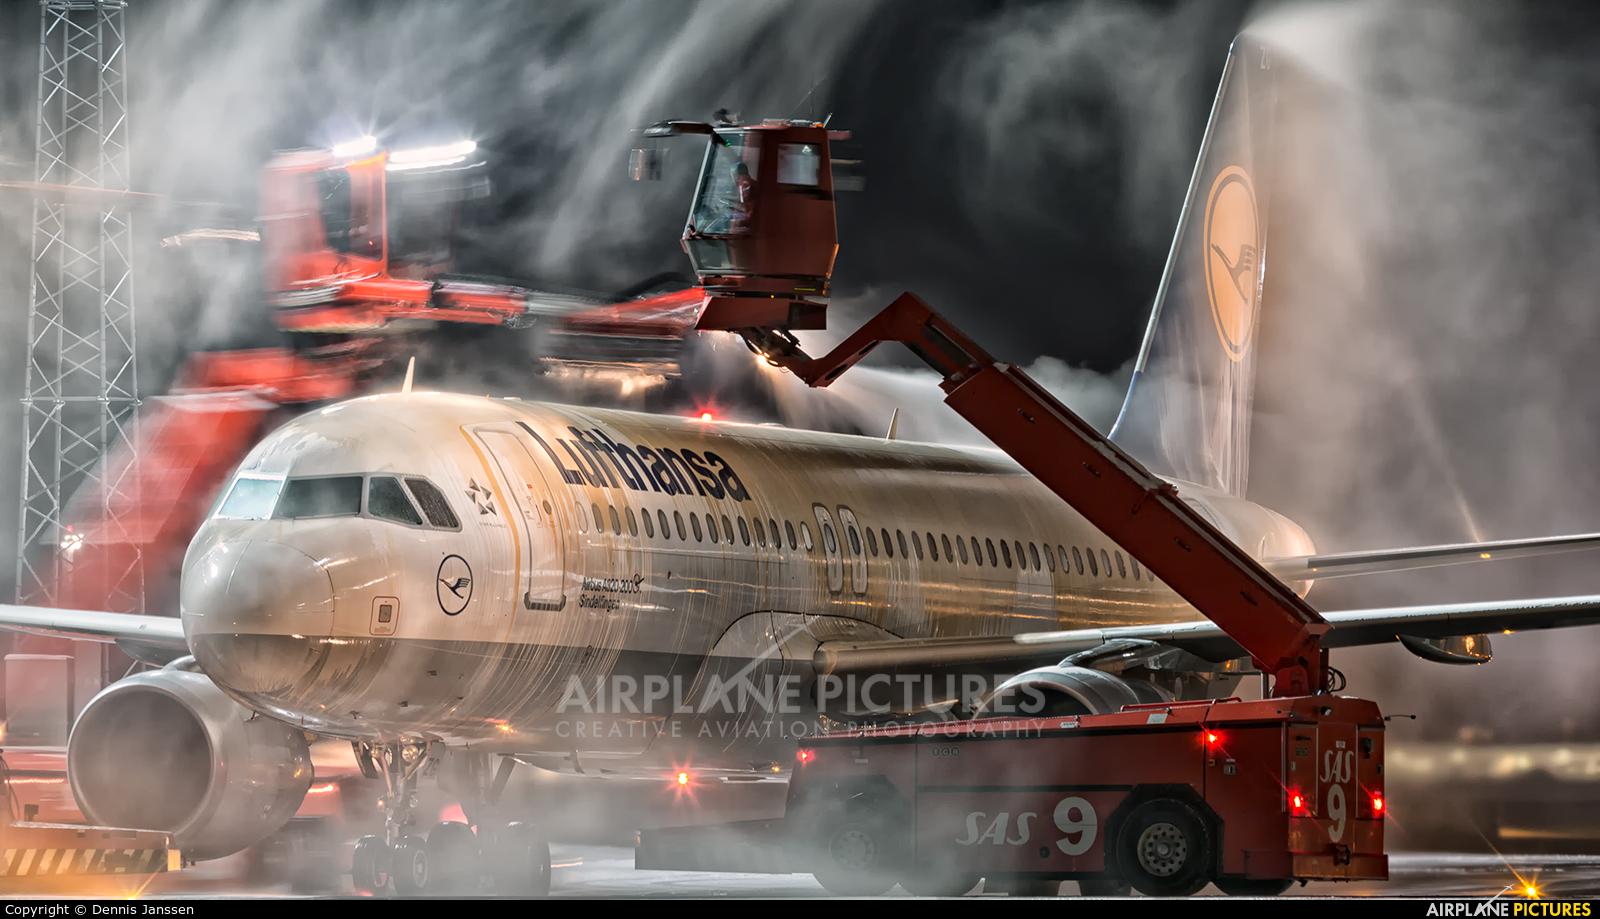 Lufthansa D-AIZG aircraft at Oslo - Gardermoen